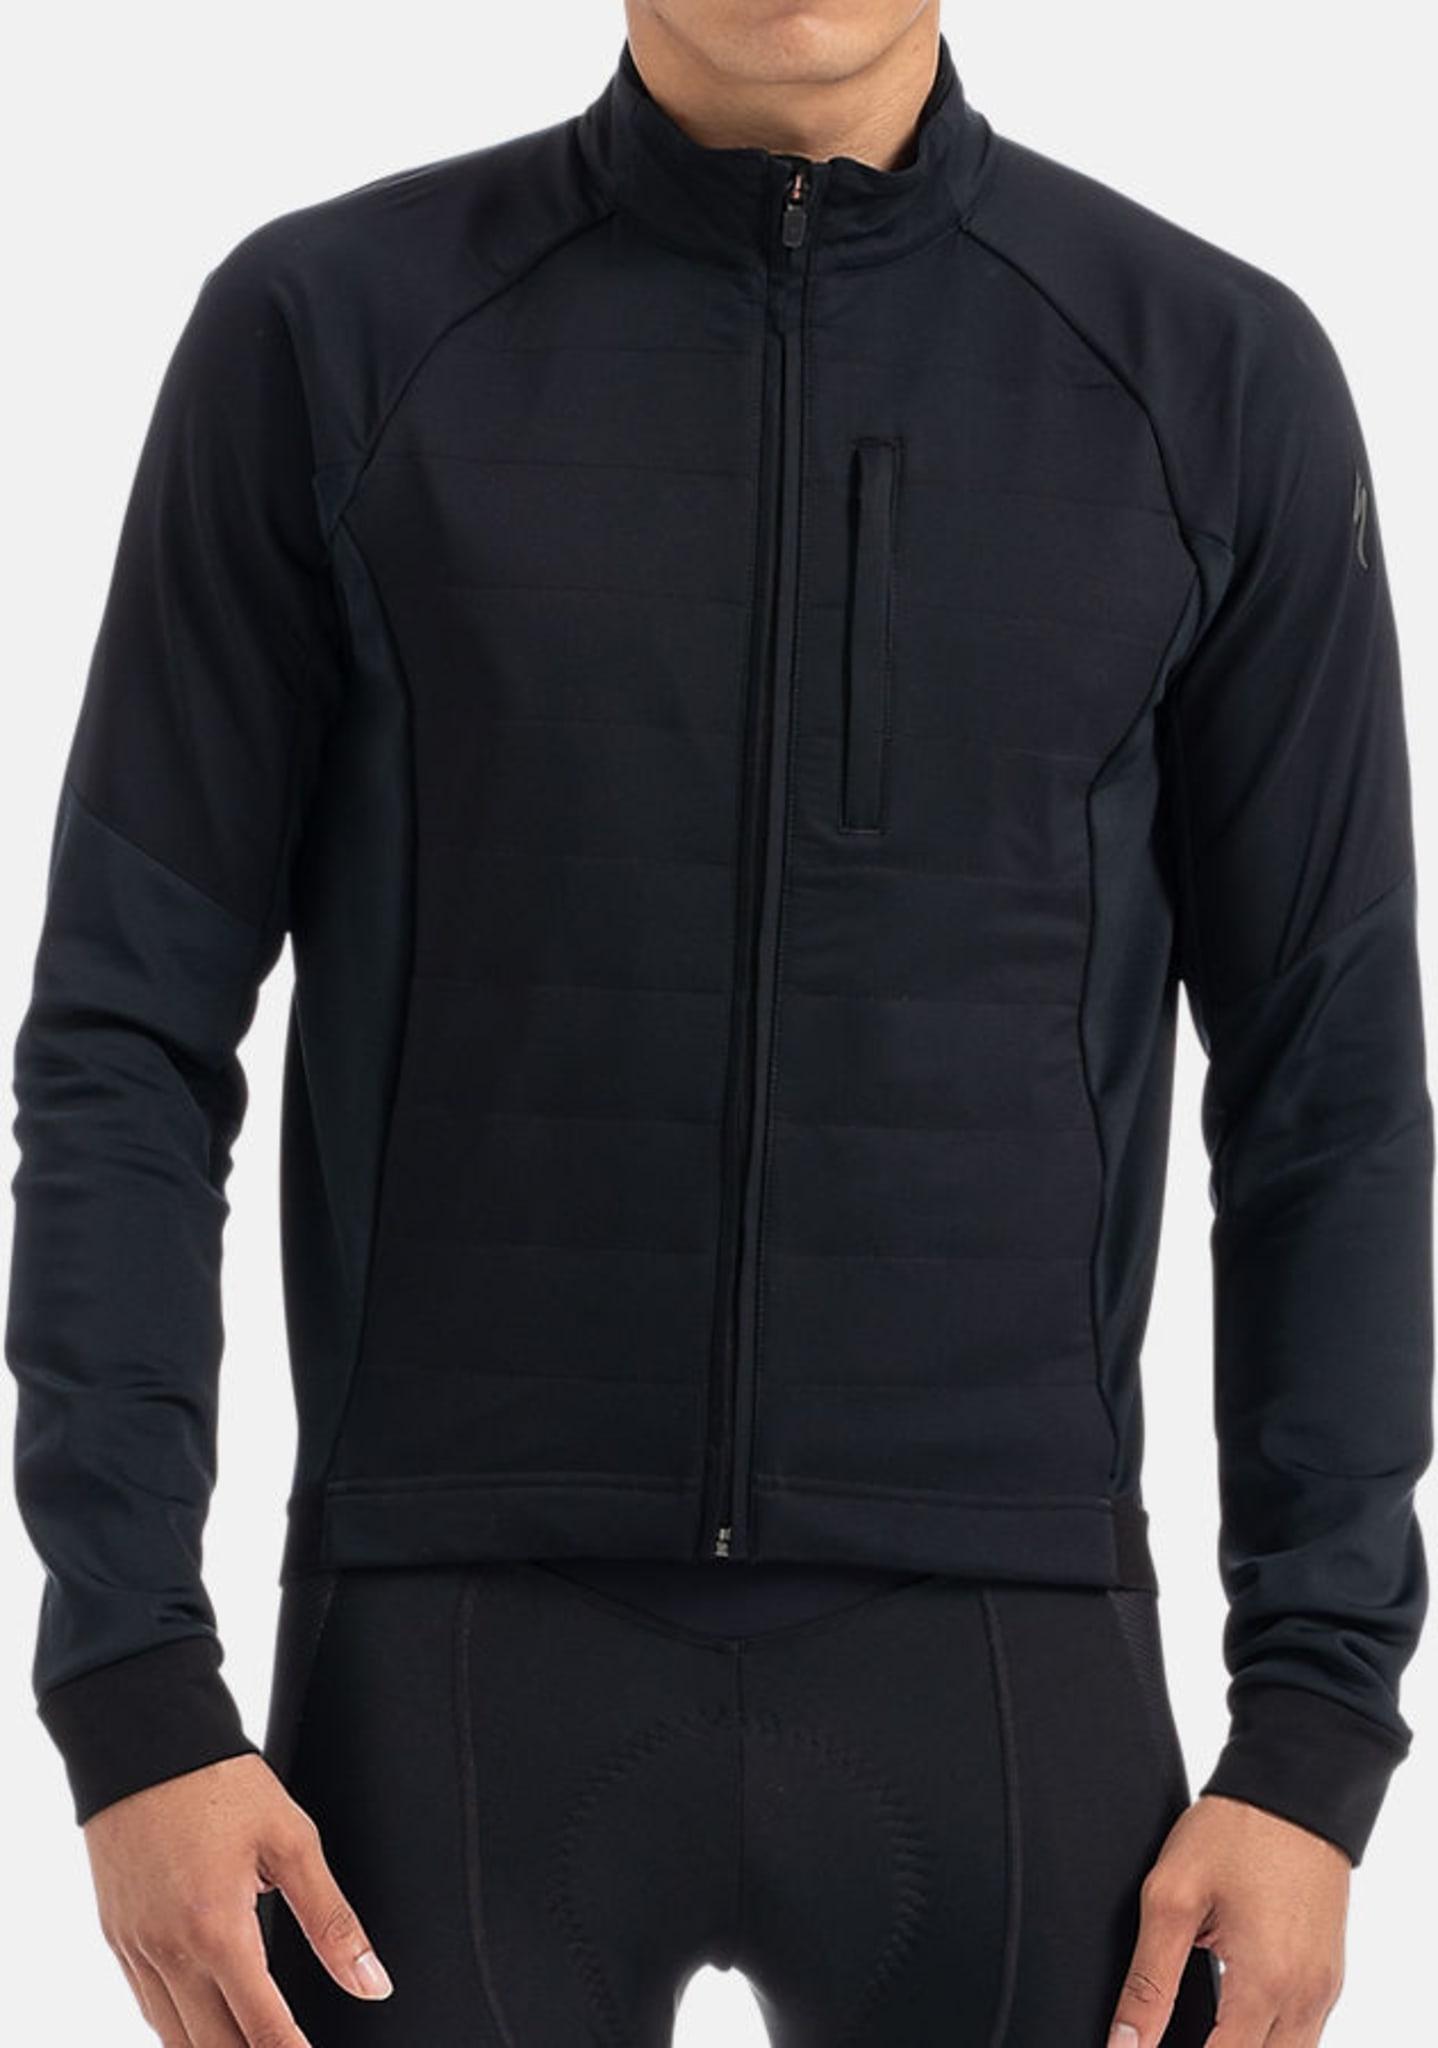 Therminal  Deflect Jacket M